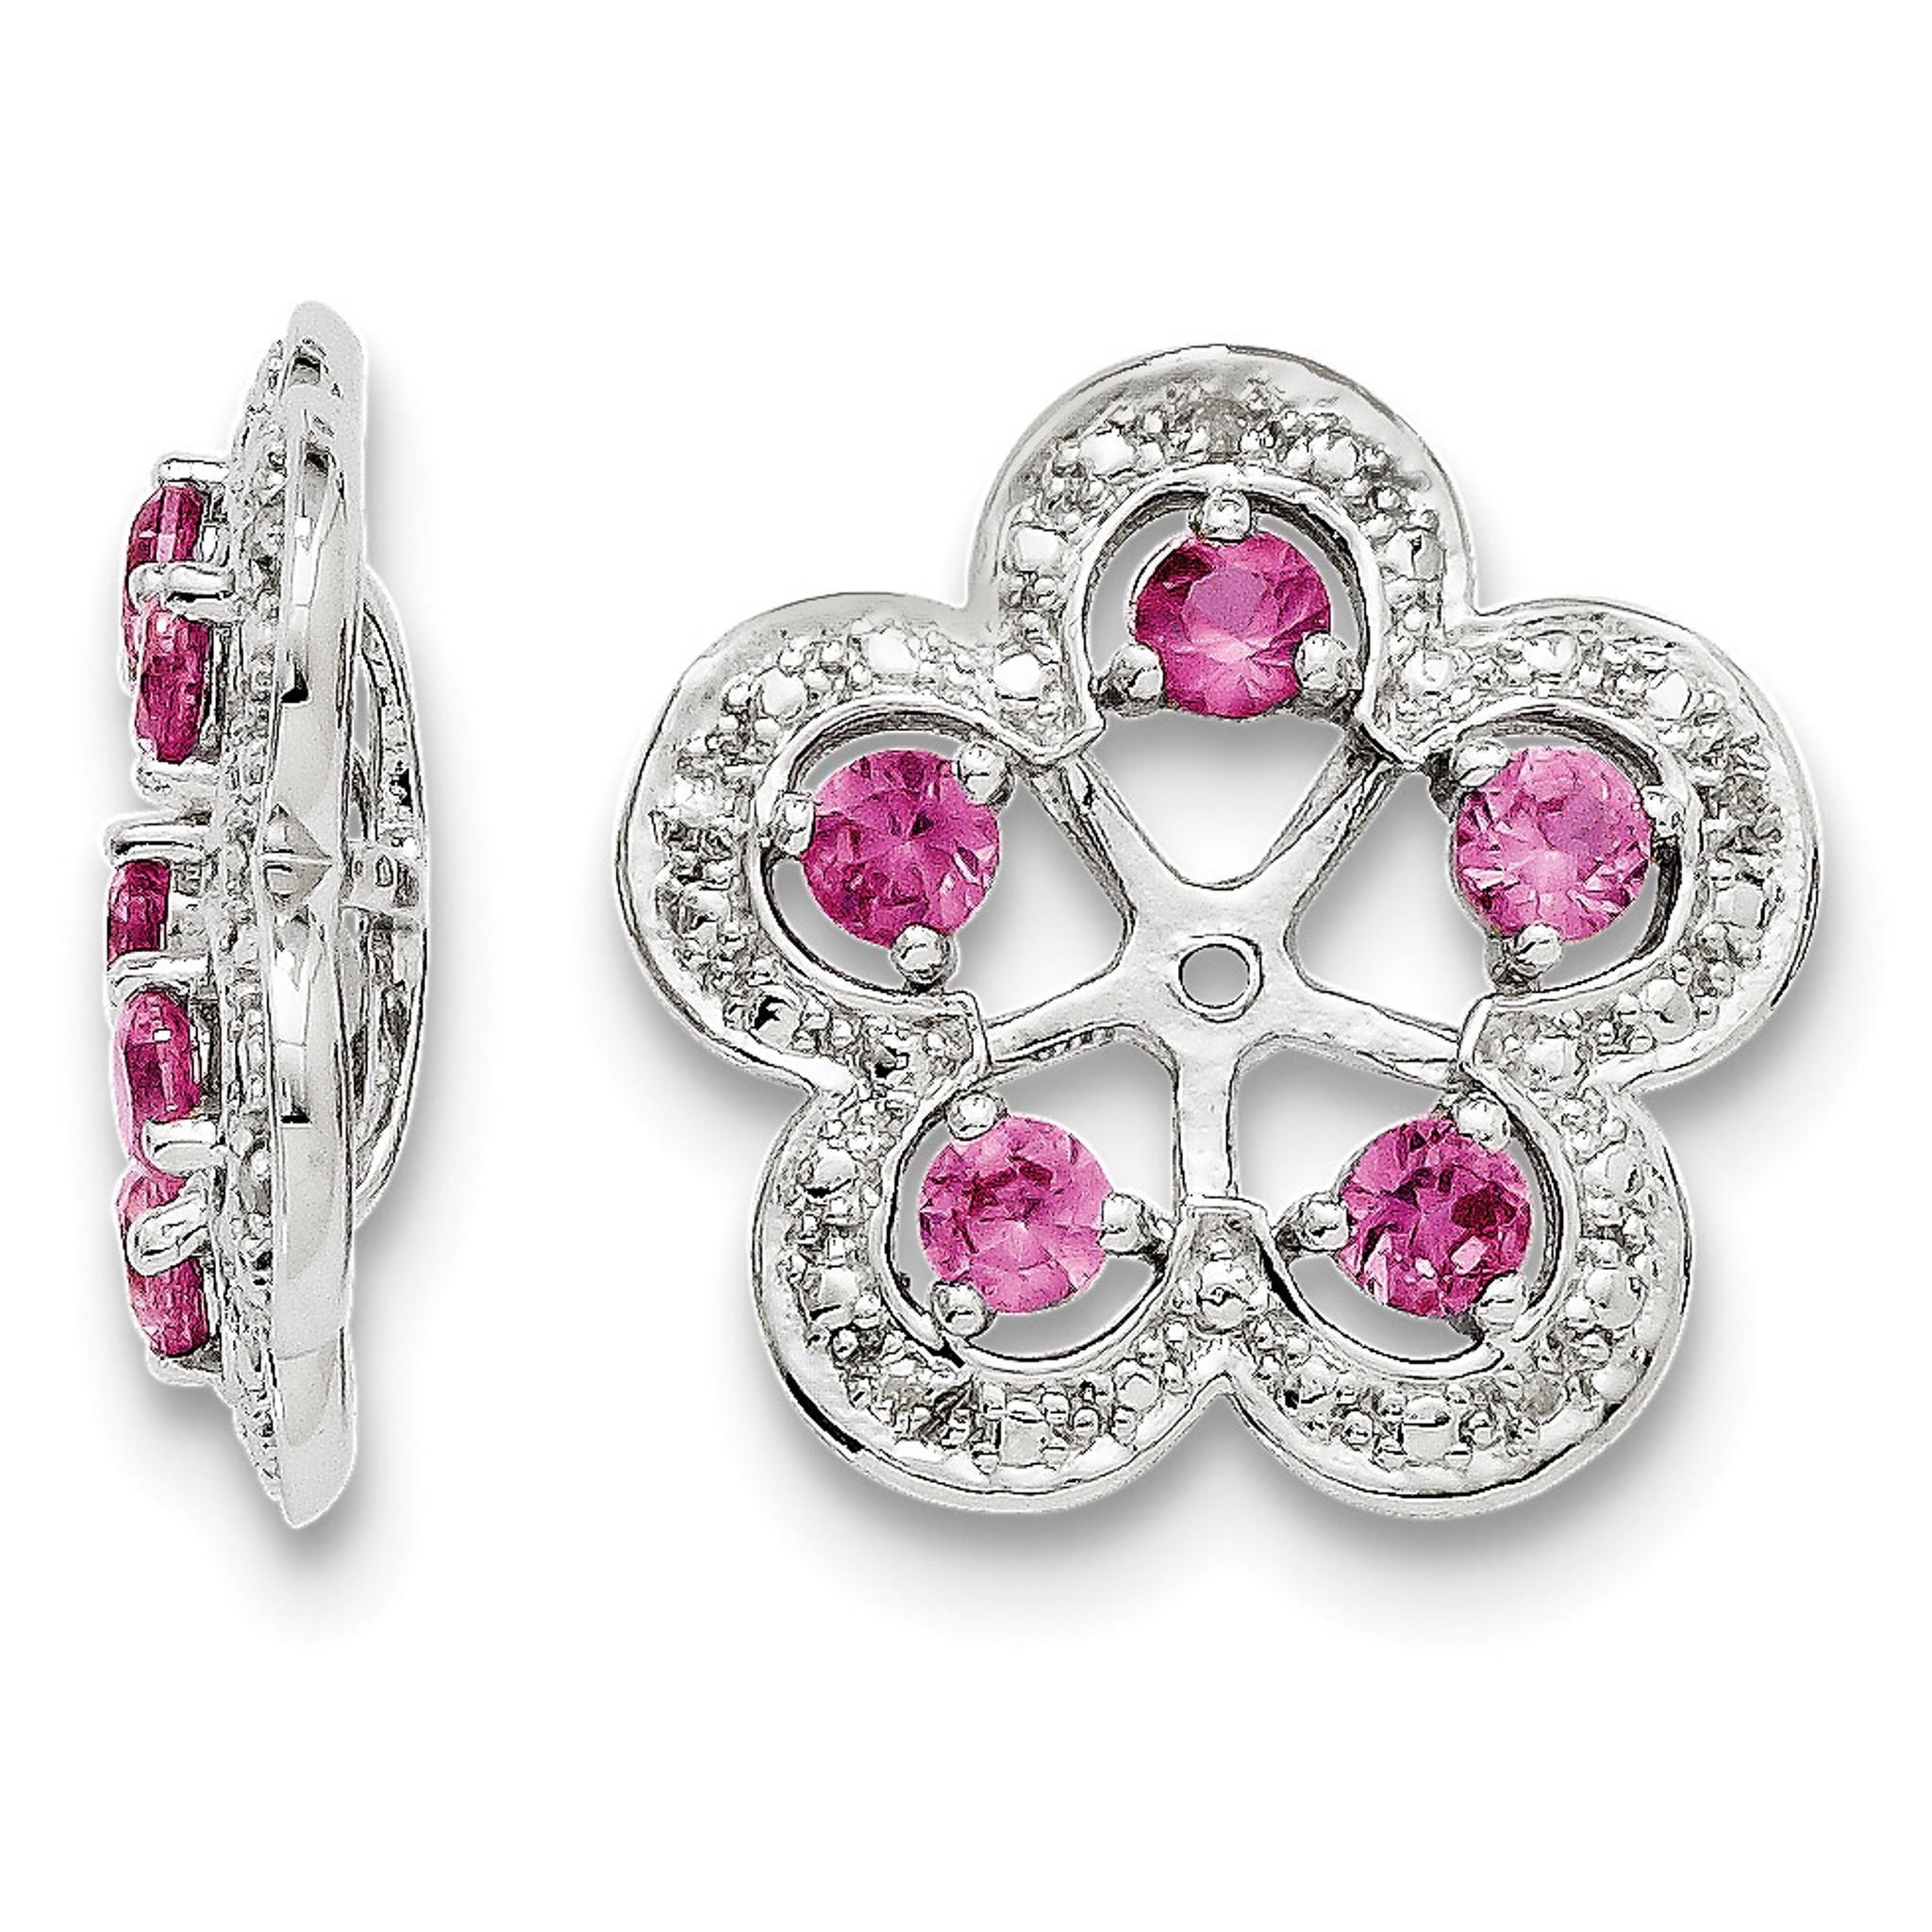 Mia Diamonds 925 Sterling Silver LogoArt Indiana University Large Enamel Pendant with Necklace